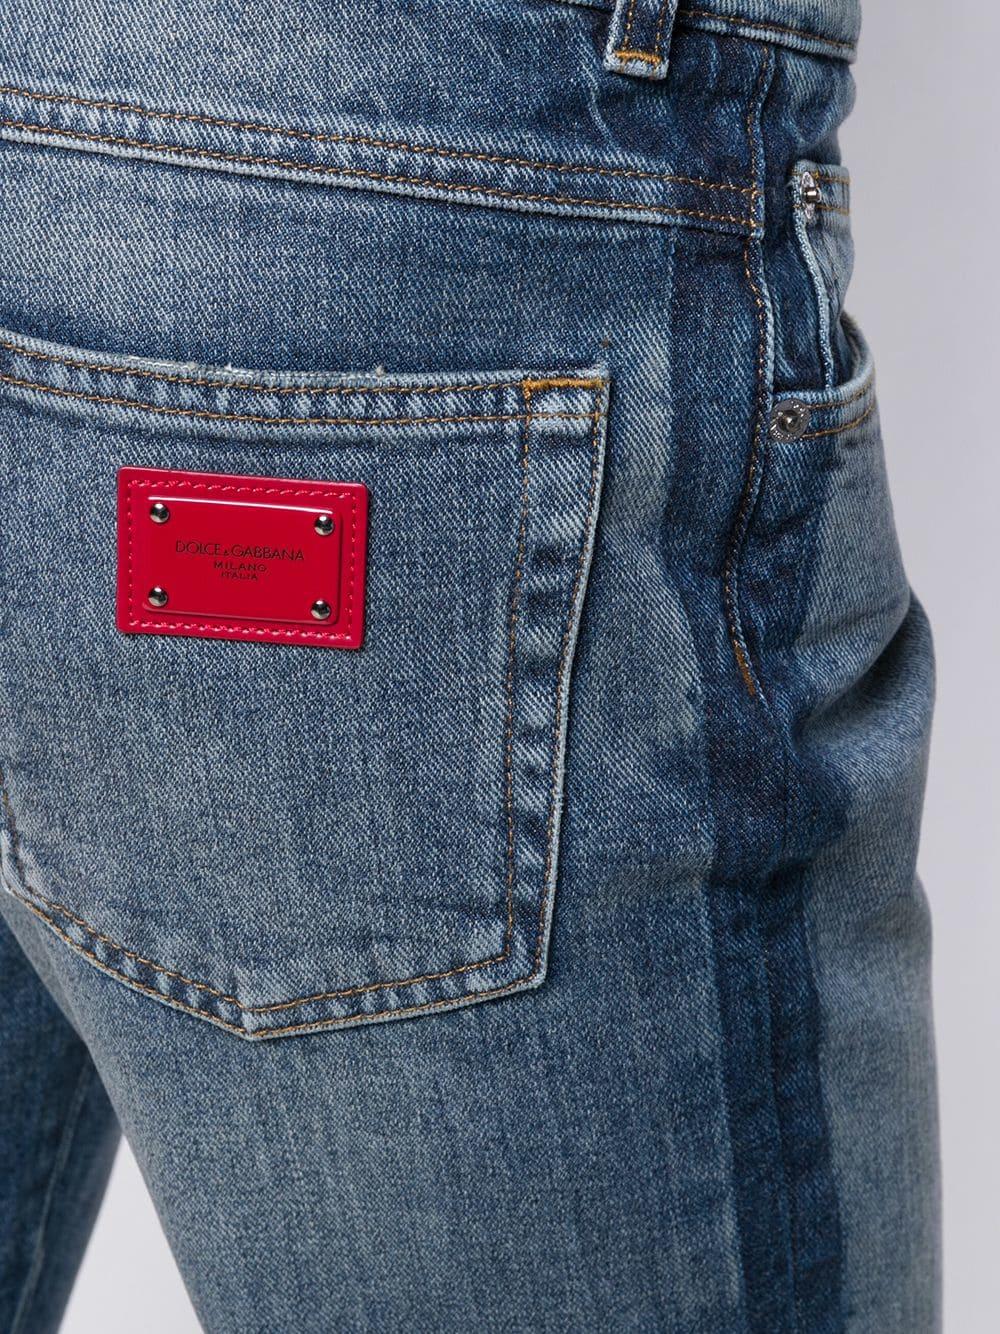 asymmetric cropped vintage effect blue jeans DOLCE & GABBANA |  | FTA0PD-G8V47S9000